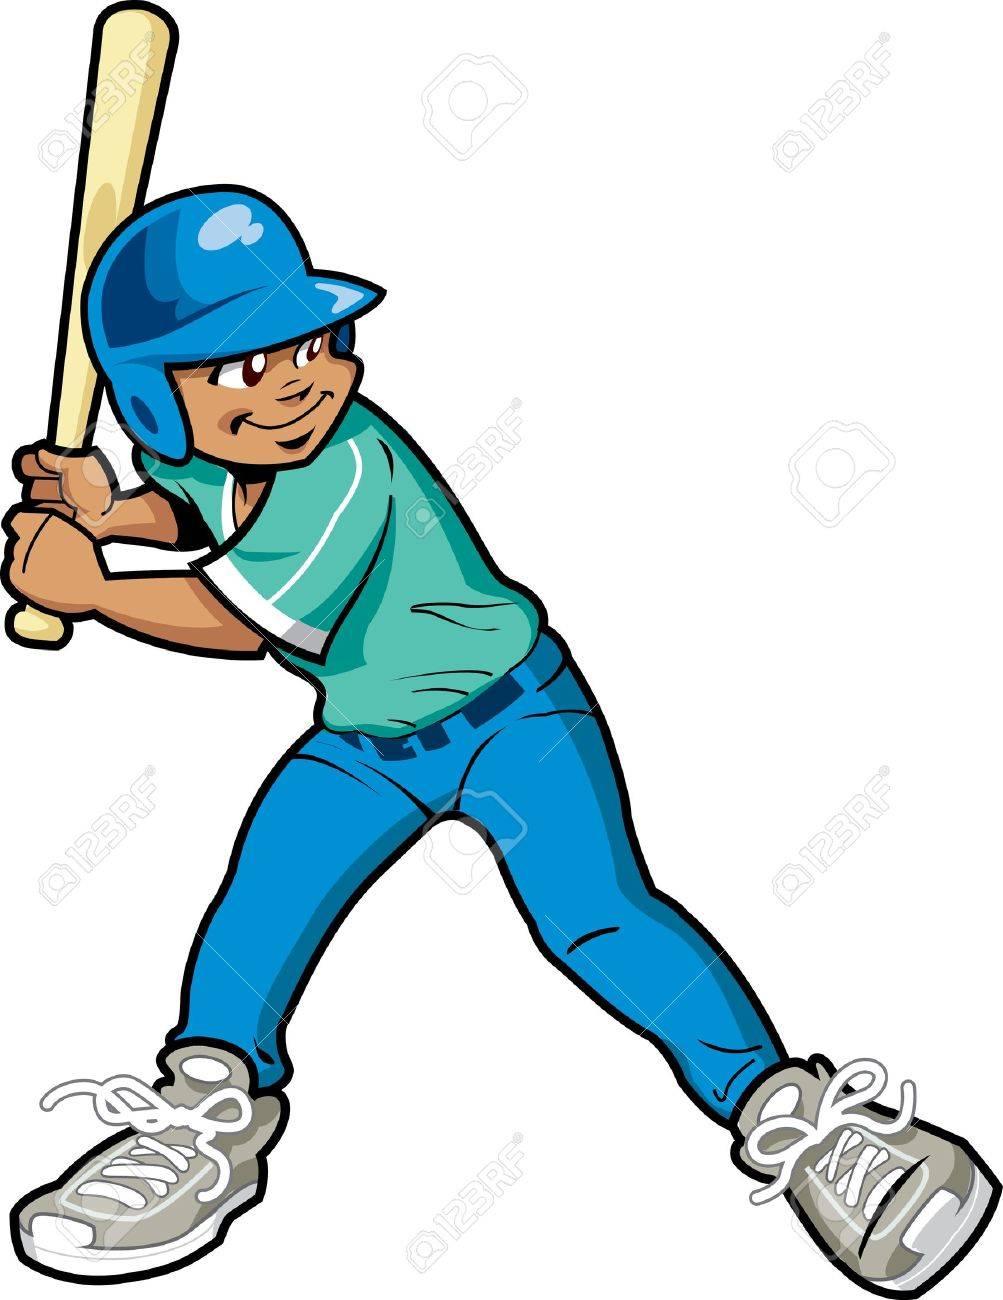 Young Boy Baseball or Softball Batter Stock Vector - 20686892